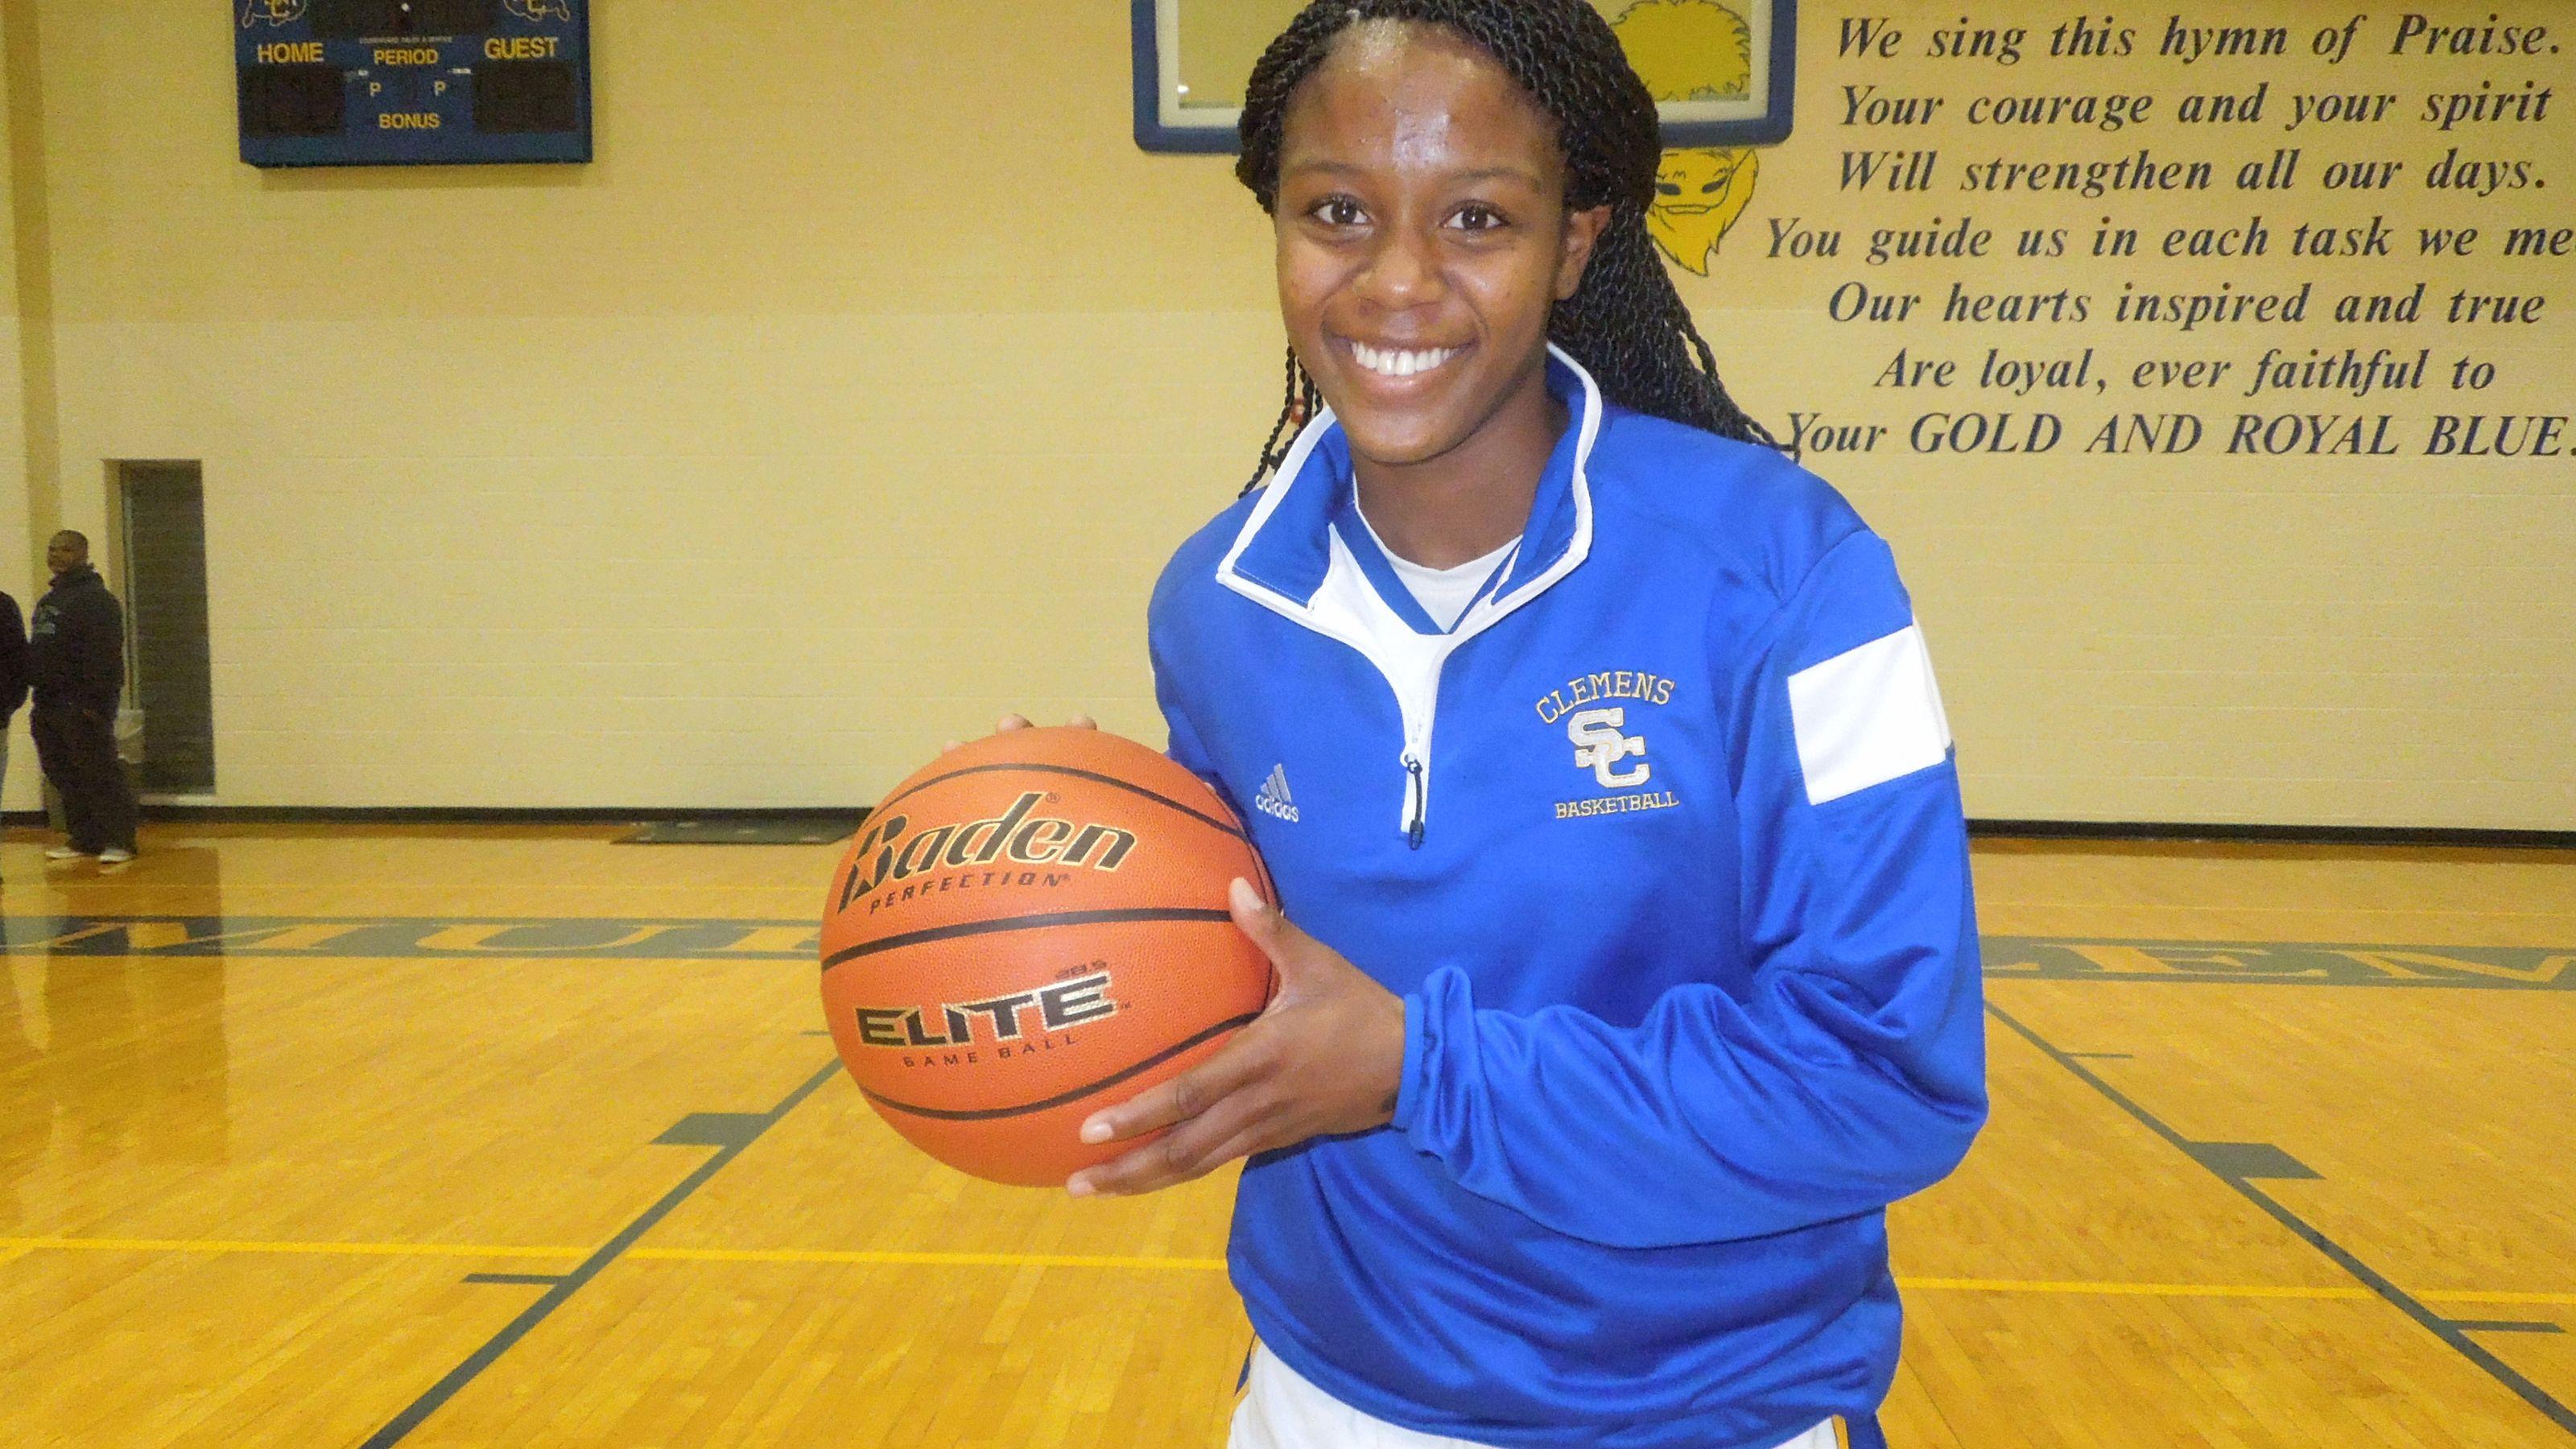 Clemens senior basketball standout Kyra Lambert has signed with Duke. (Photo: David Flores / Kens5.com)